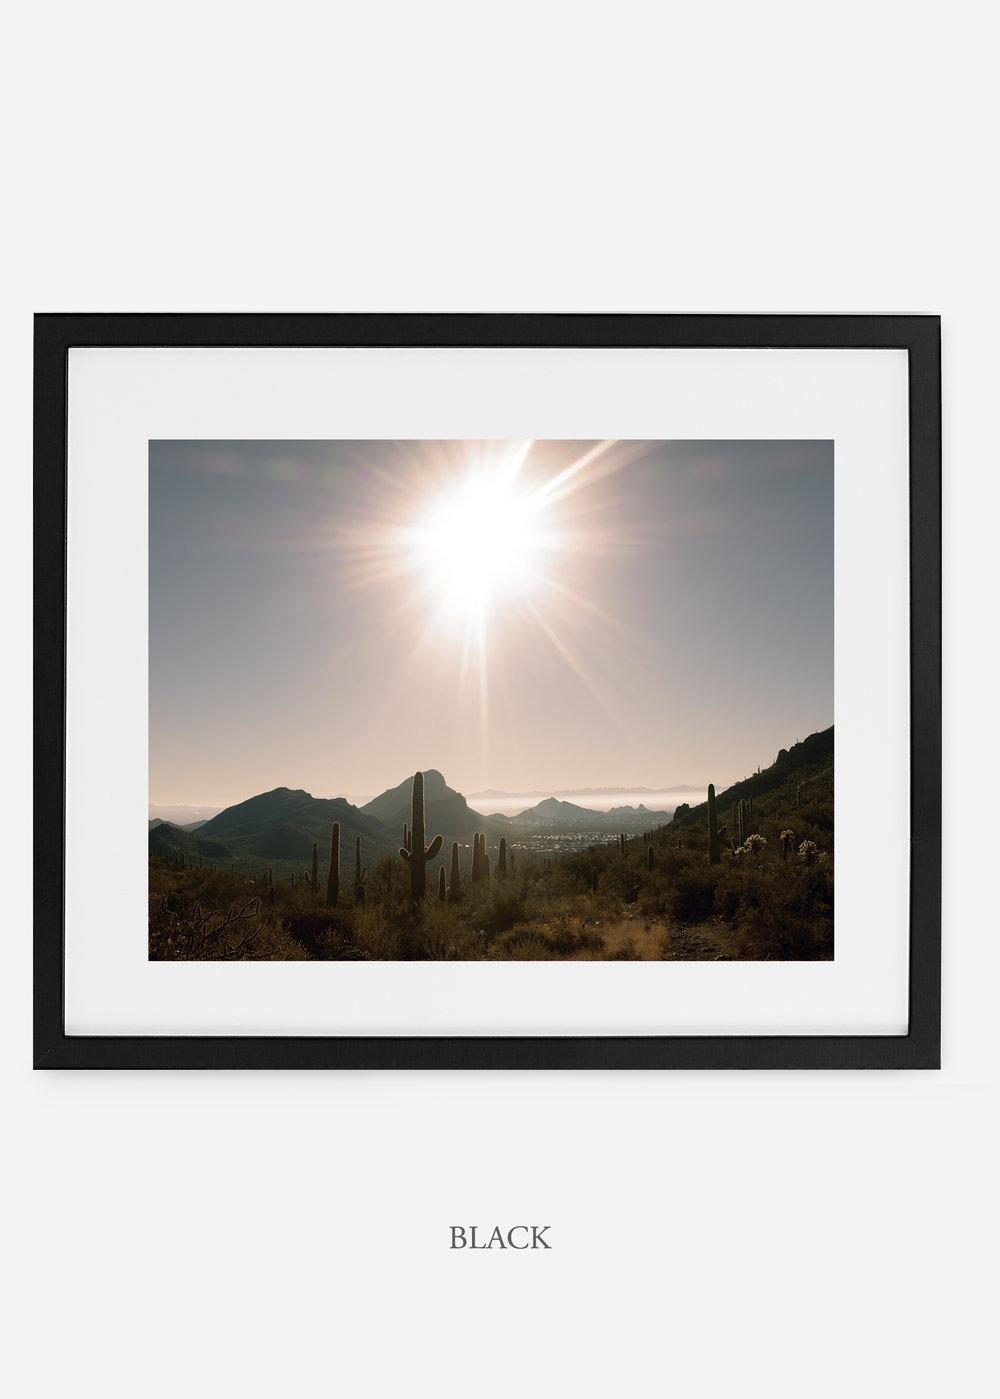 blackframe-saguaroNo.15-wildercalifornia-art-wallart-cactusprint-homedecor-prints-arizona-botanical-artwork-interiordesign.jpg